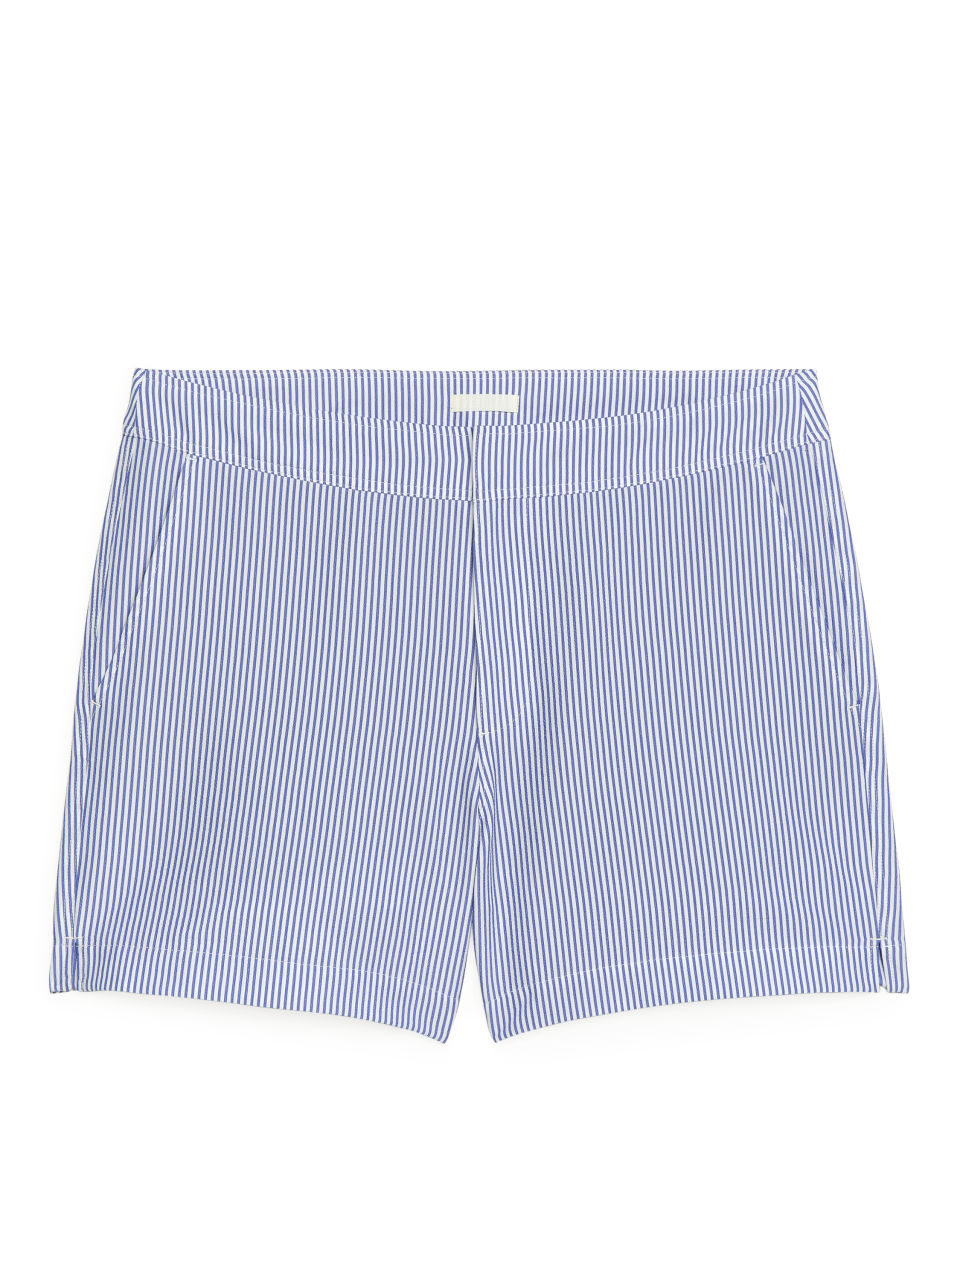 Seersucker Swim Shorts - White